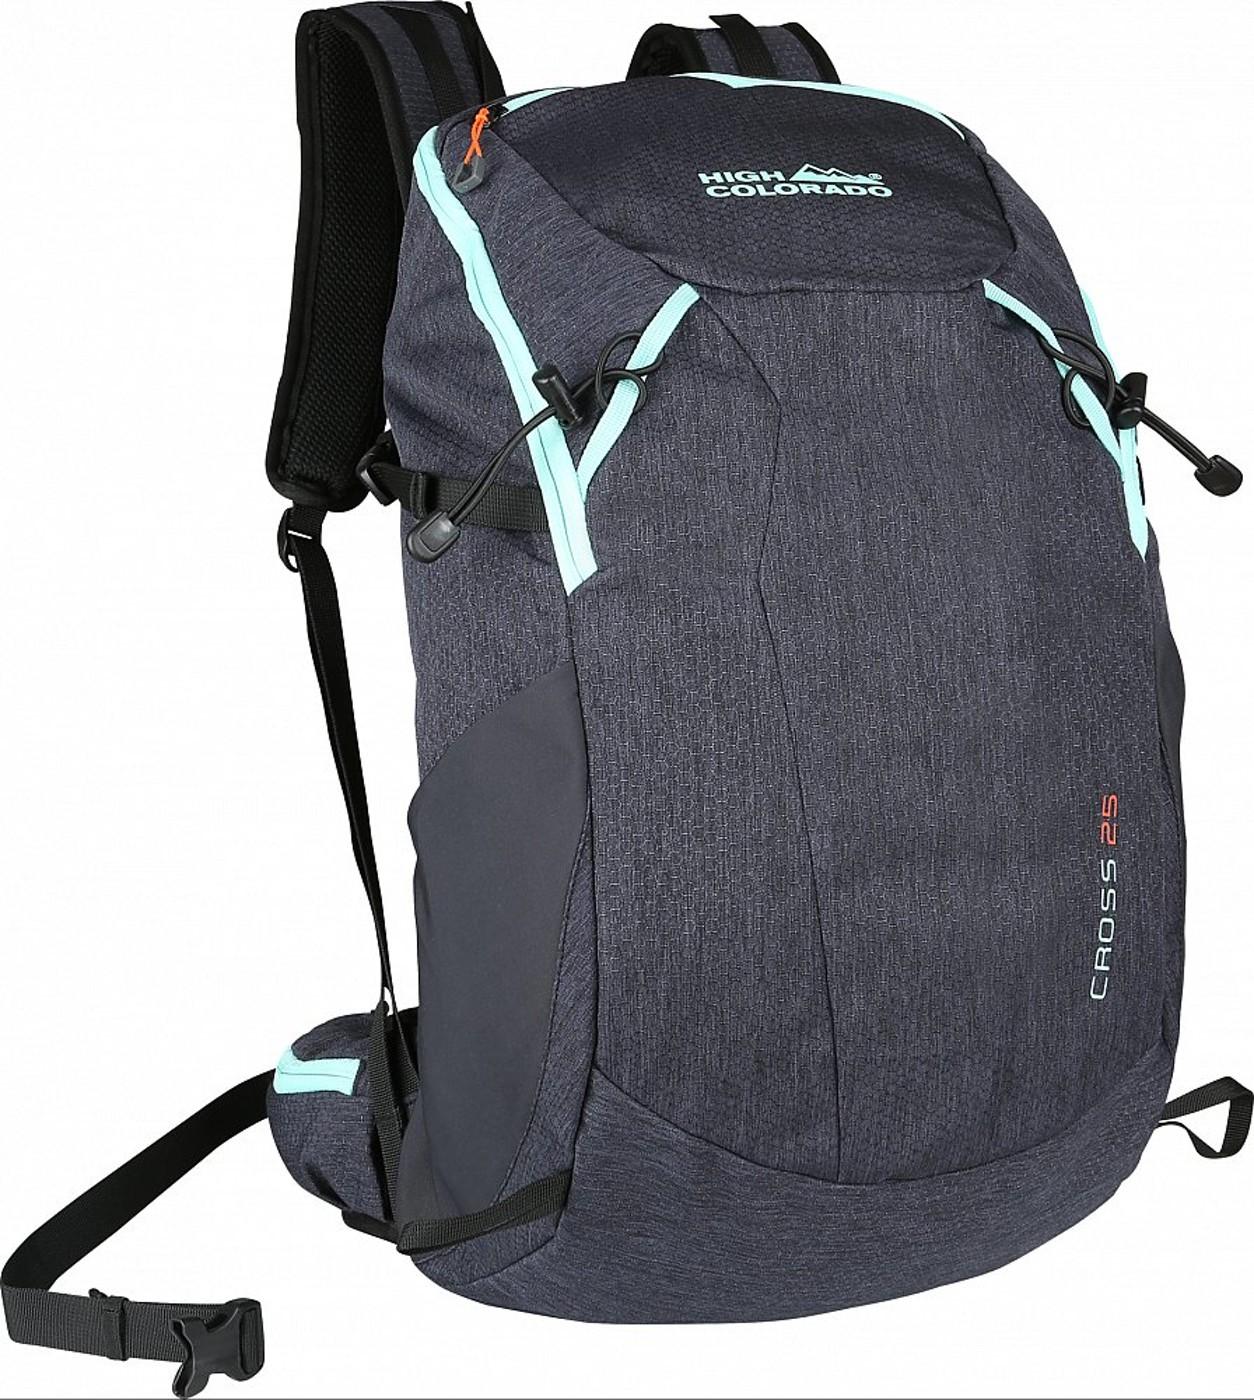 HIGH COLORADO CROSS 28, Hiking backpack